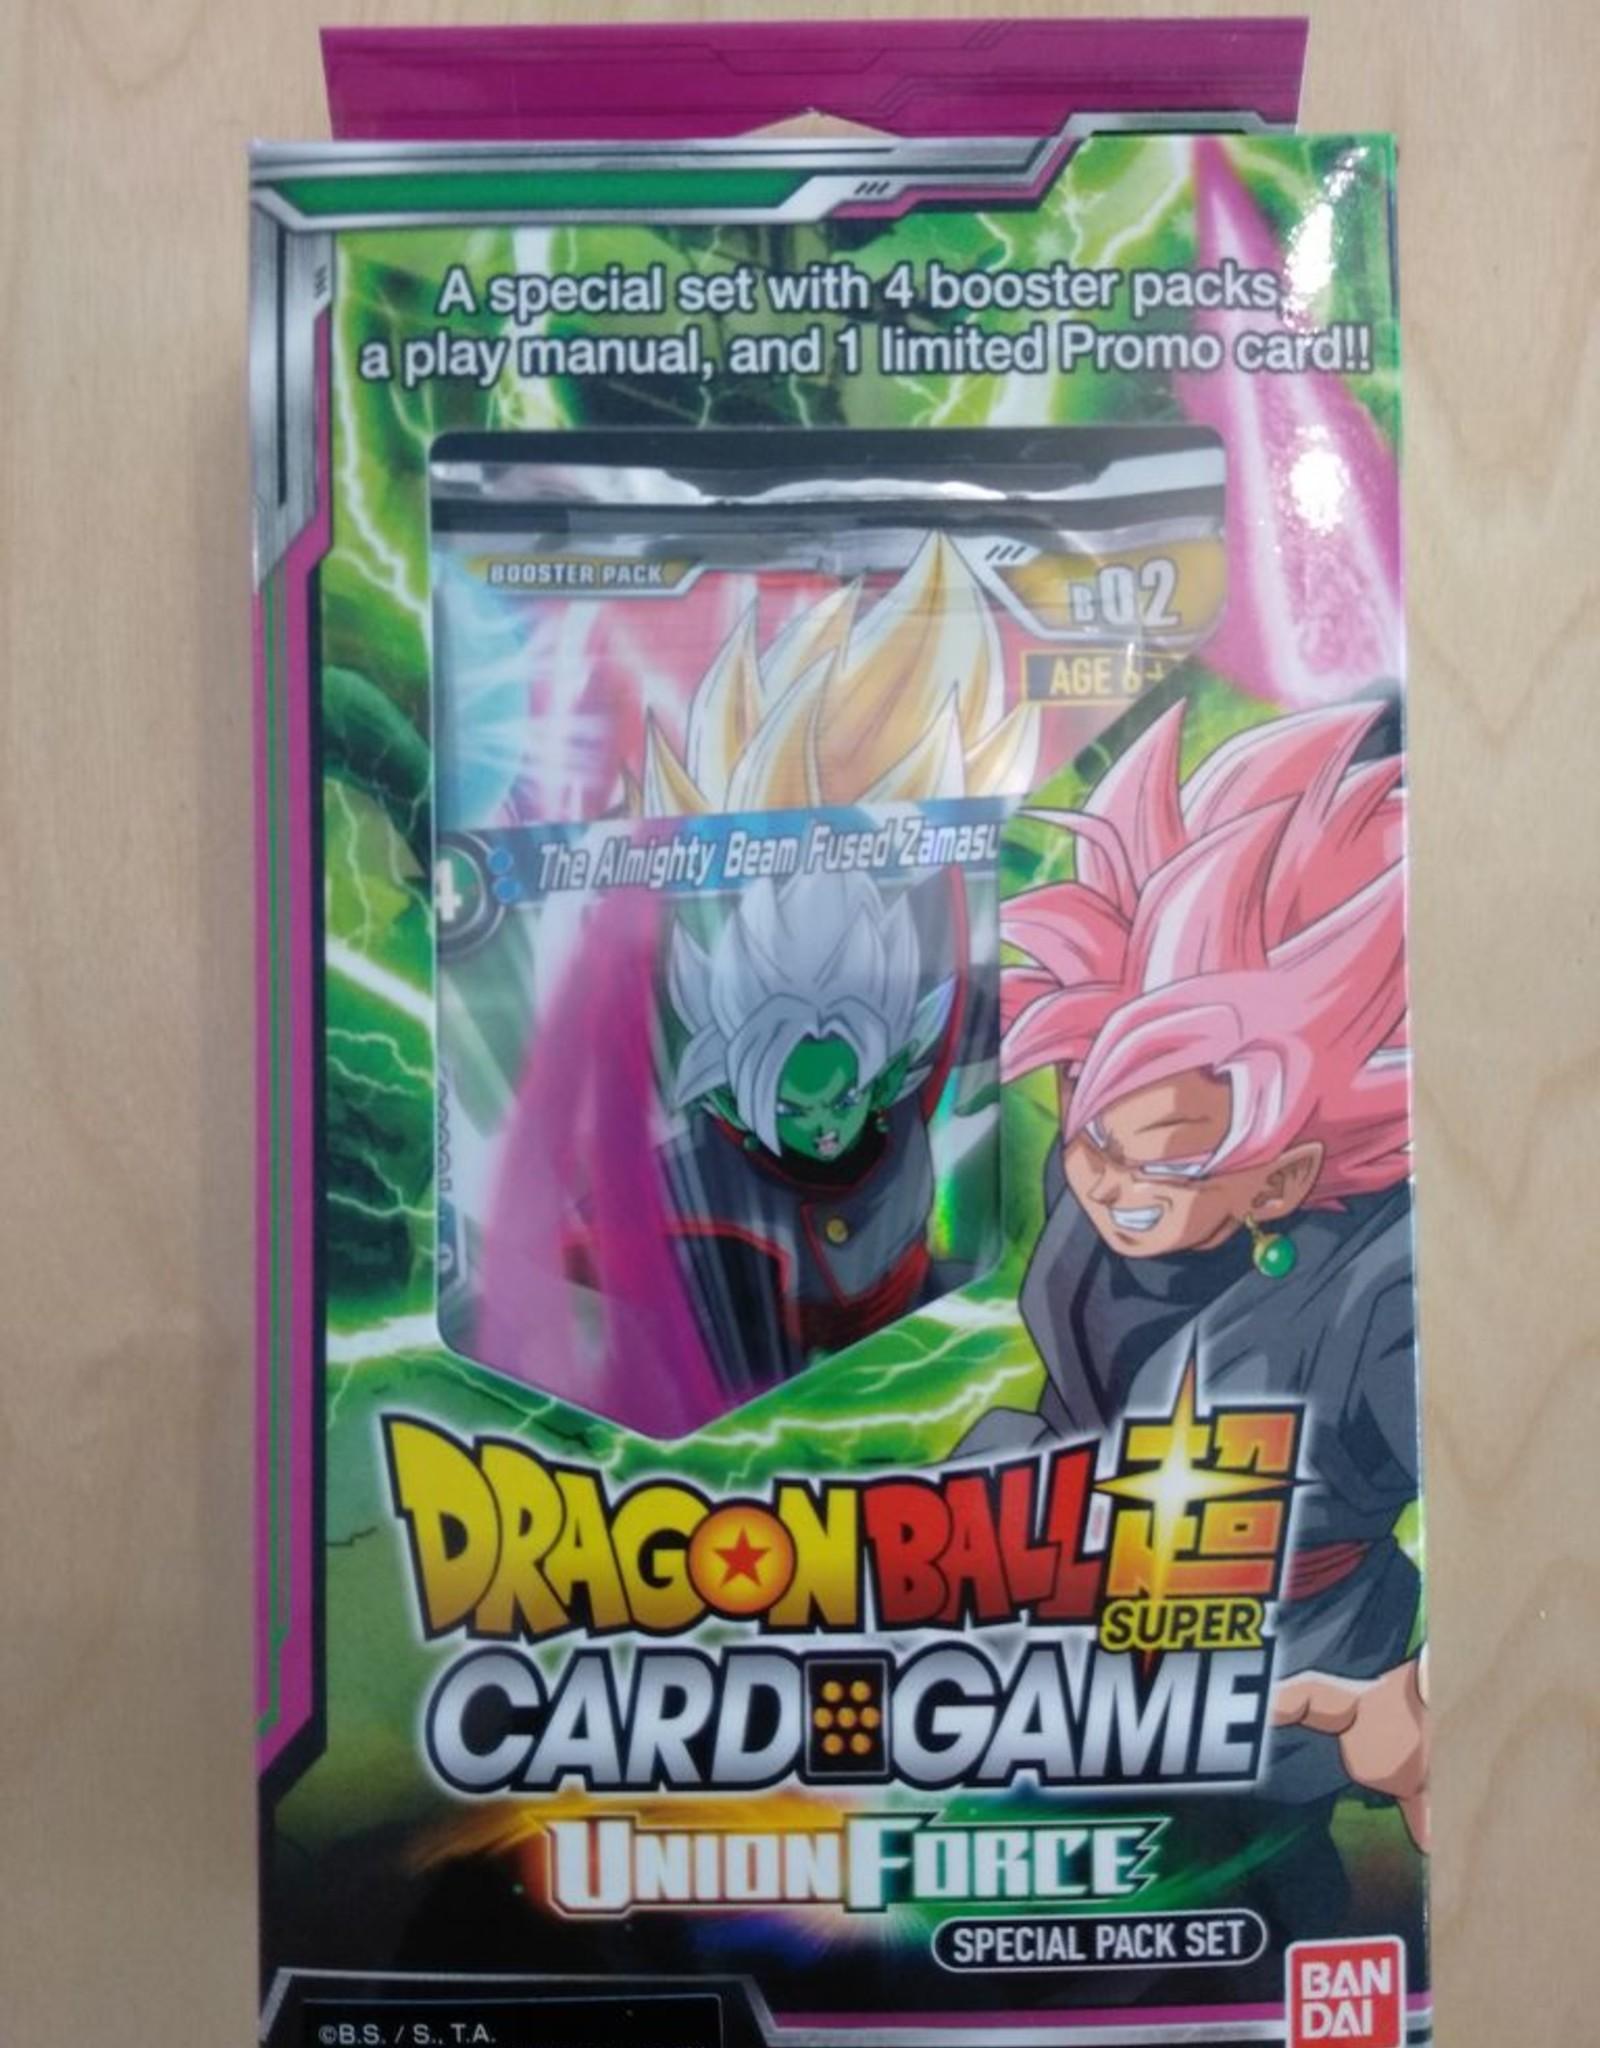 DBS - Dragon Ball Super Dragon Ball Super Card Game - Union Force Special Pack Set - EN